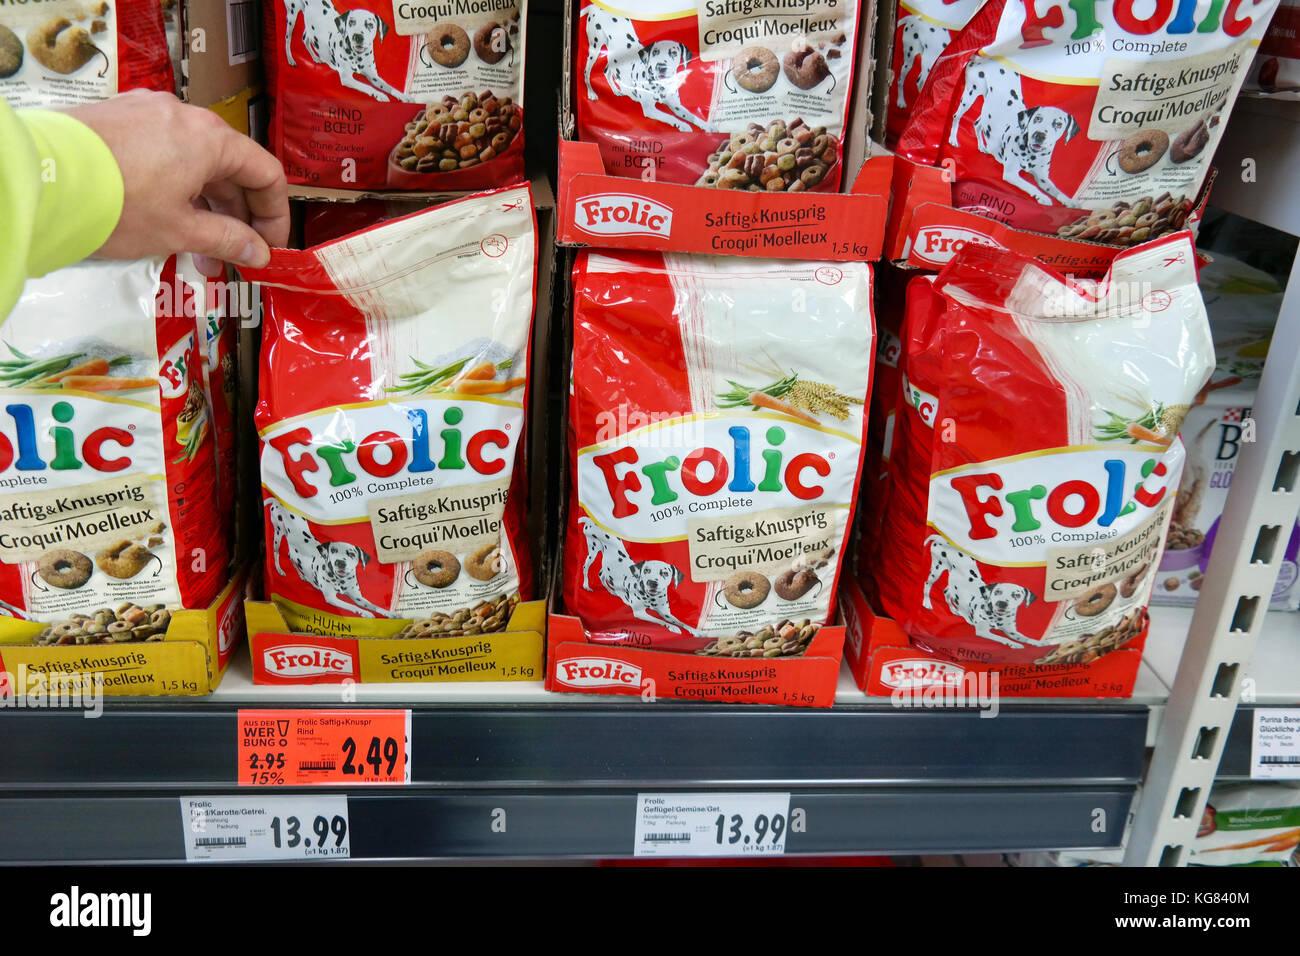 Frolic Dry Dog Food